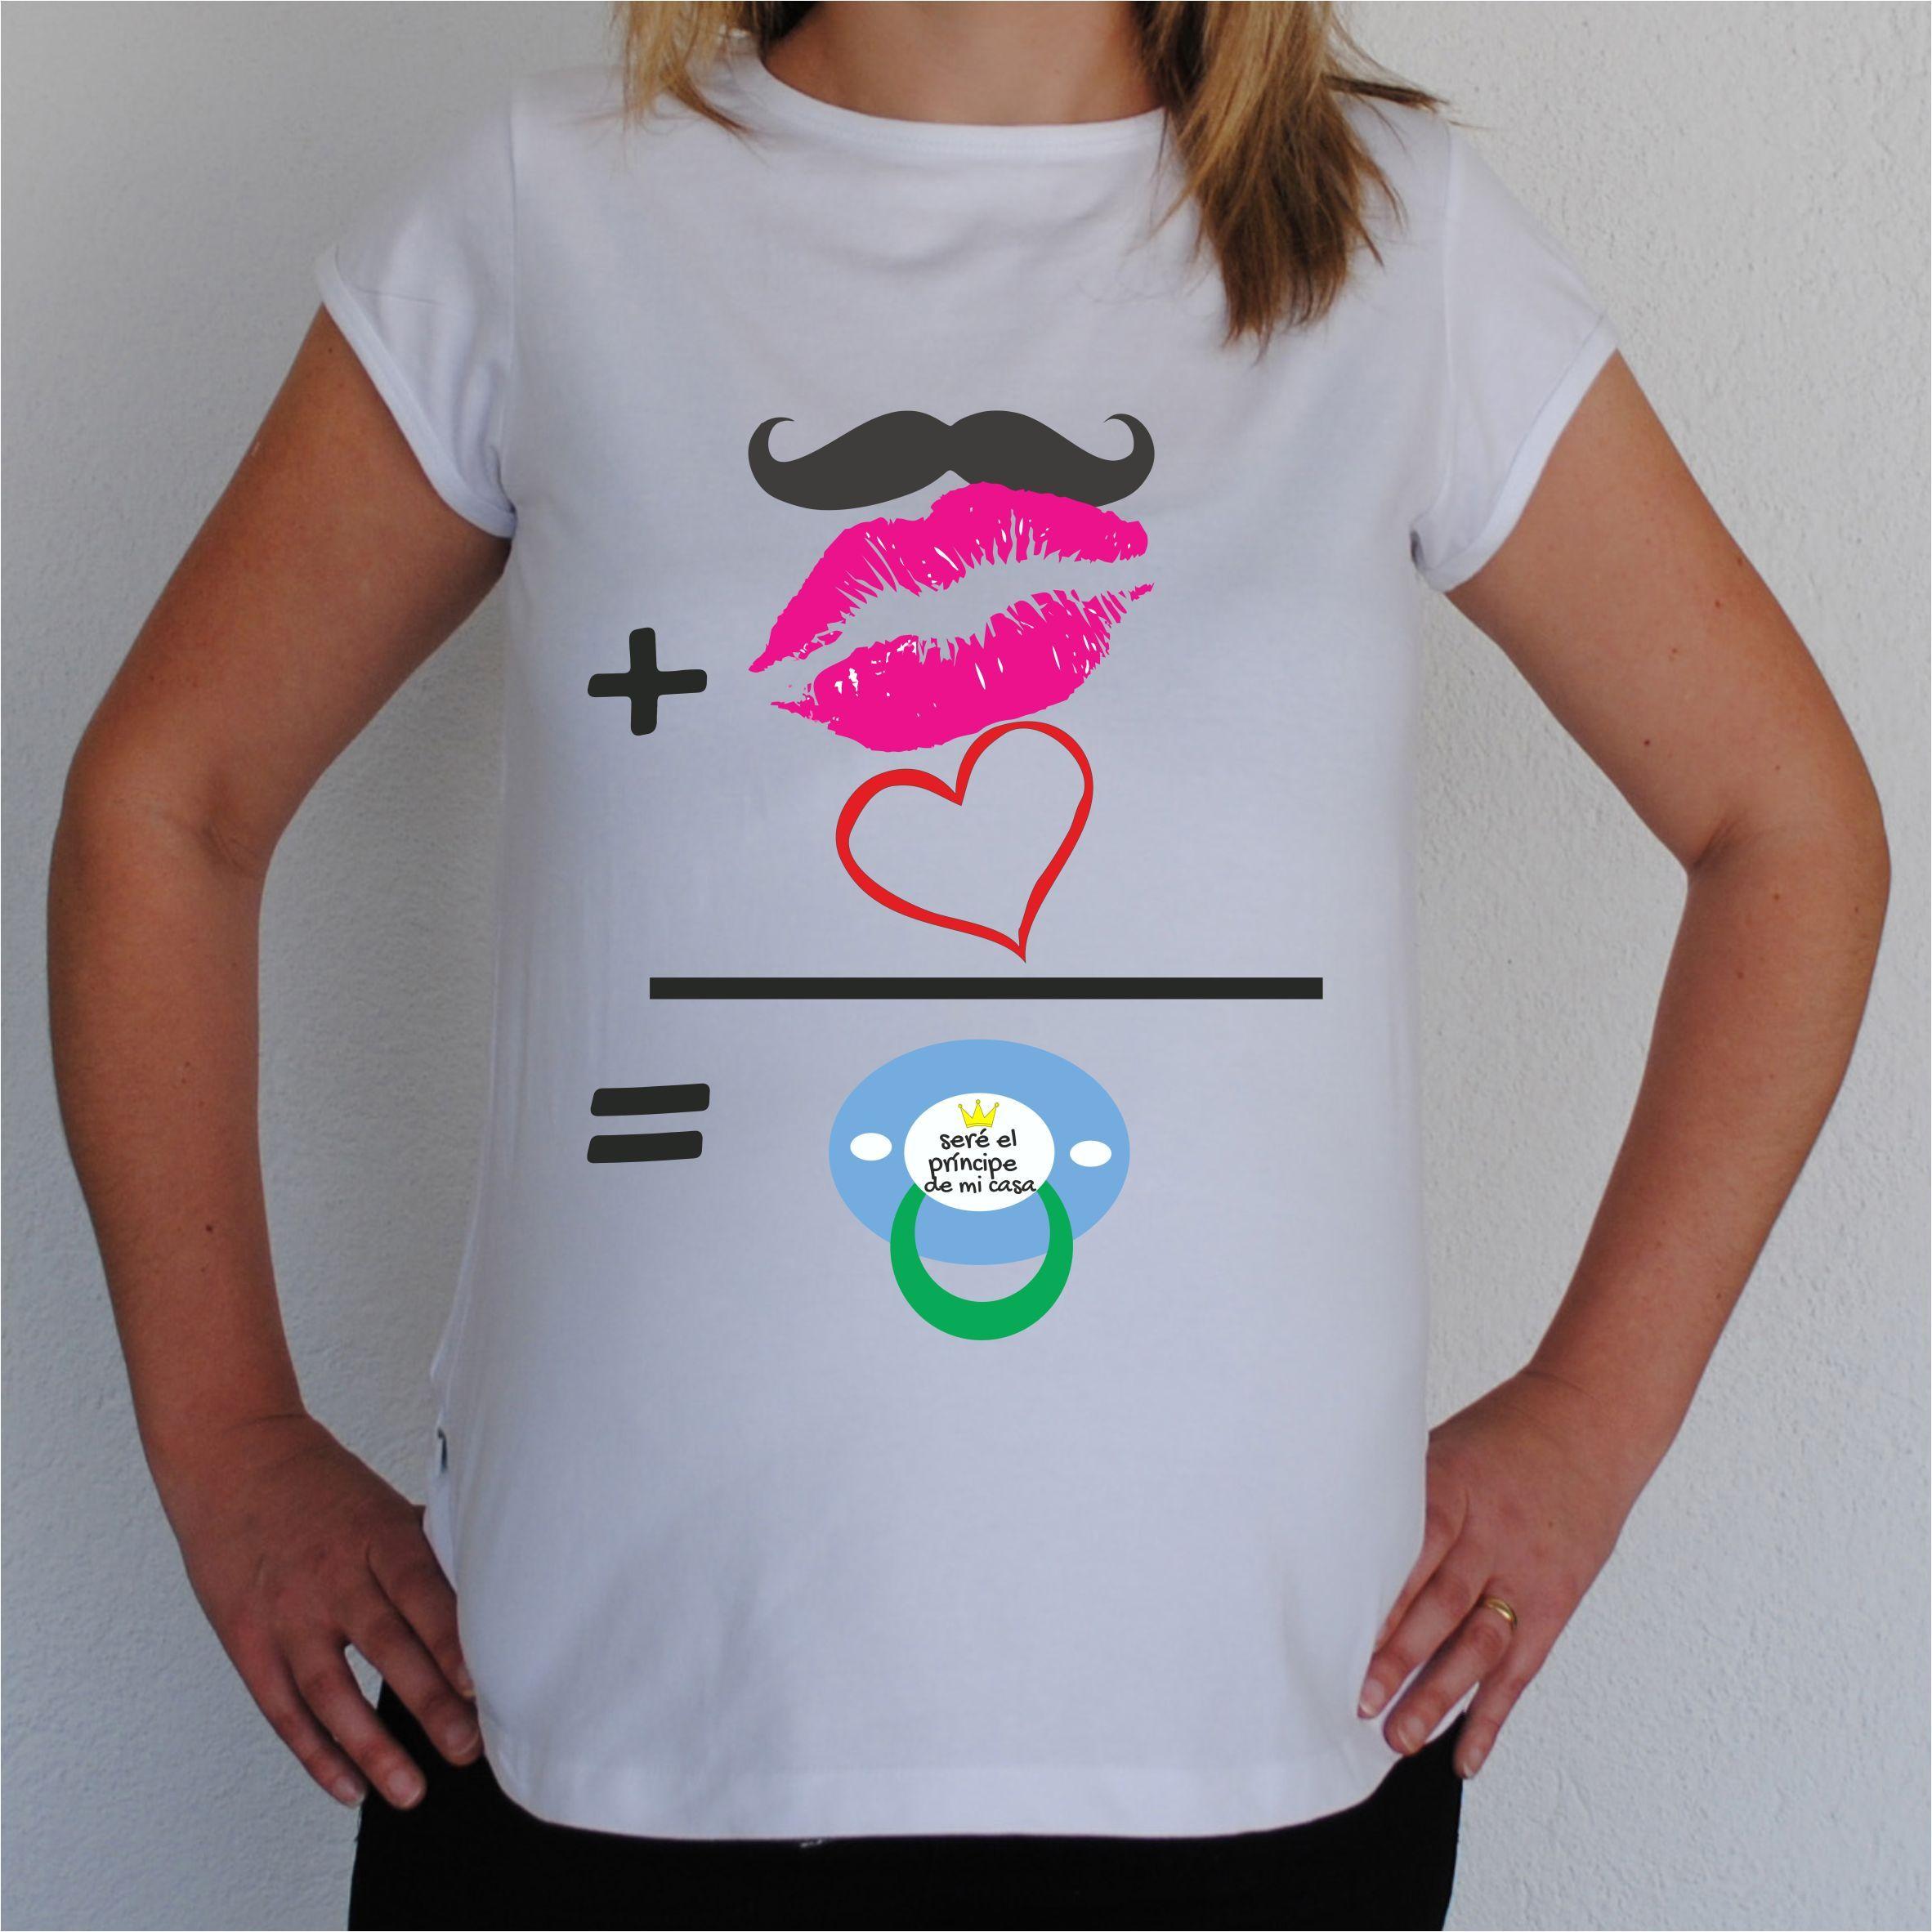 Camisetas para Embarazadas Divertidas - Suma niño | polos poleras ...